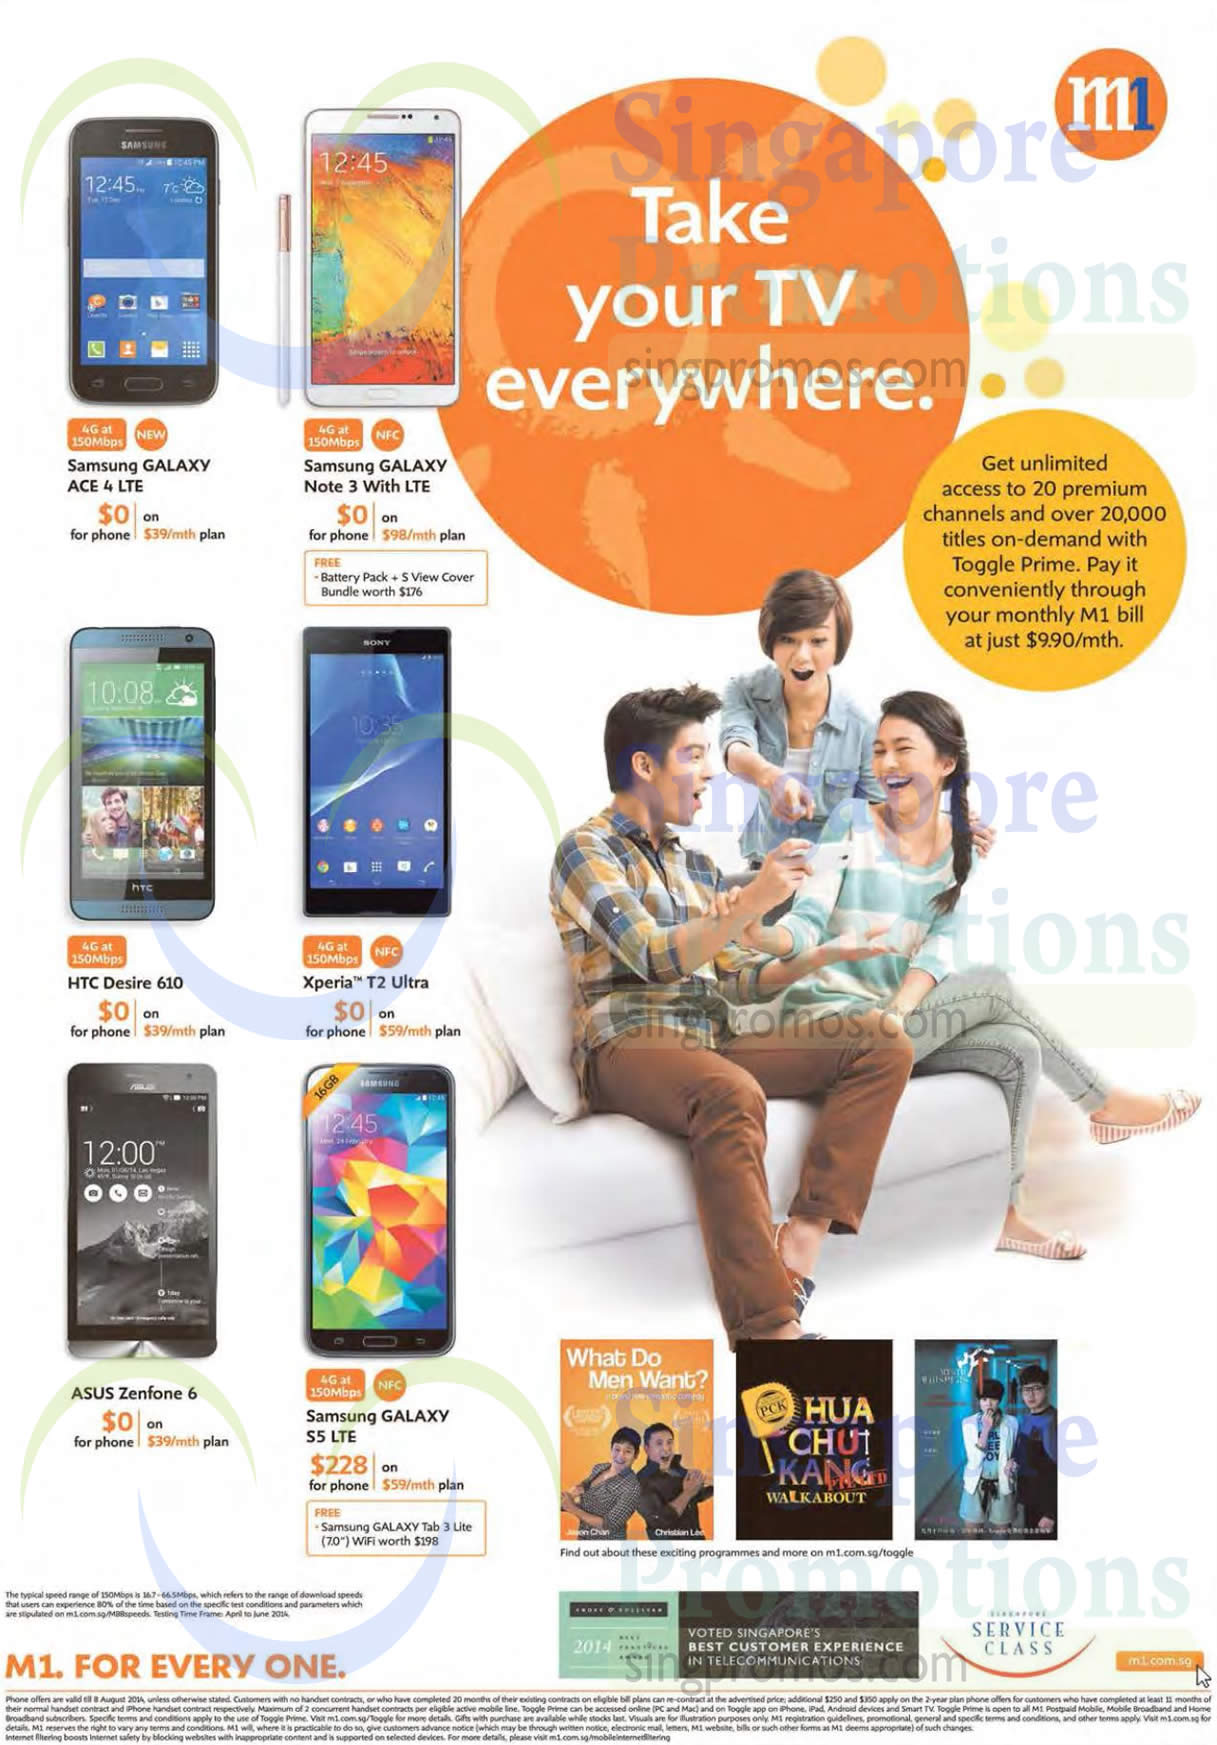 Samsung Galaxy Ace 4, Samsung Galaxy Note 3, Samsung Galaxy S5, HTC Desire 610, Sony Xperia T2 Ultra, Asus Zenfone 6